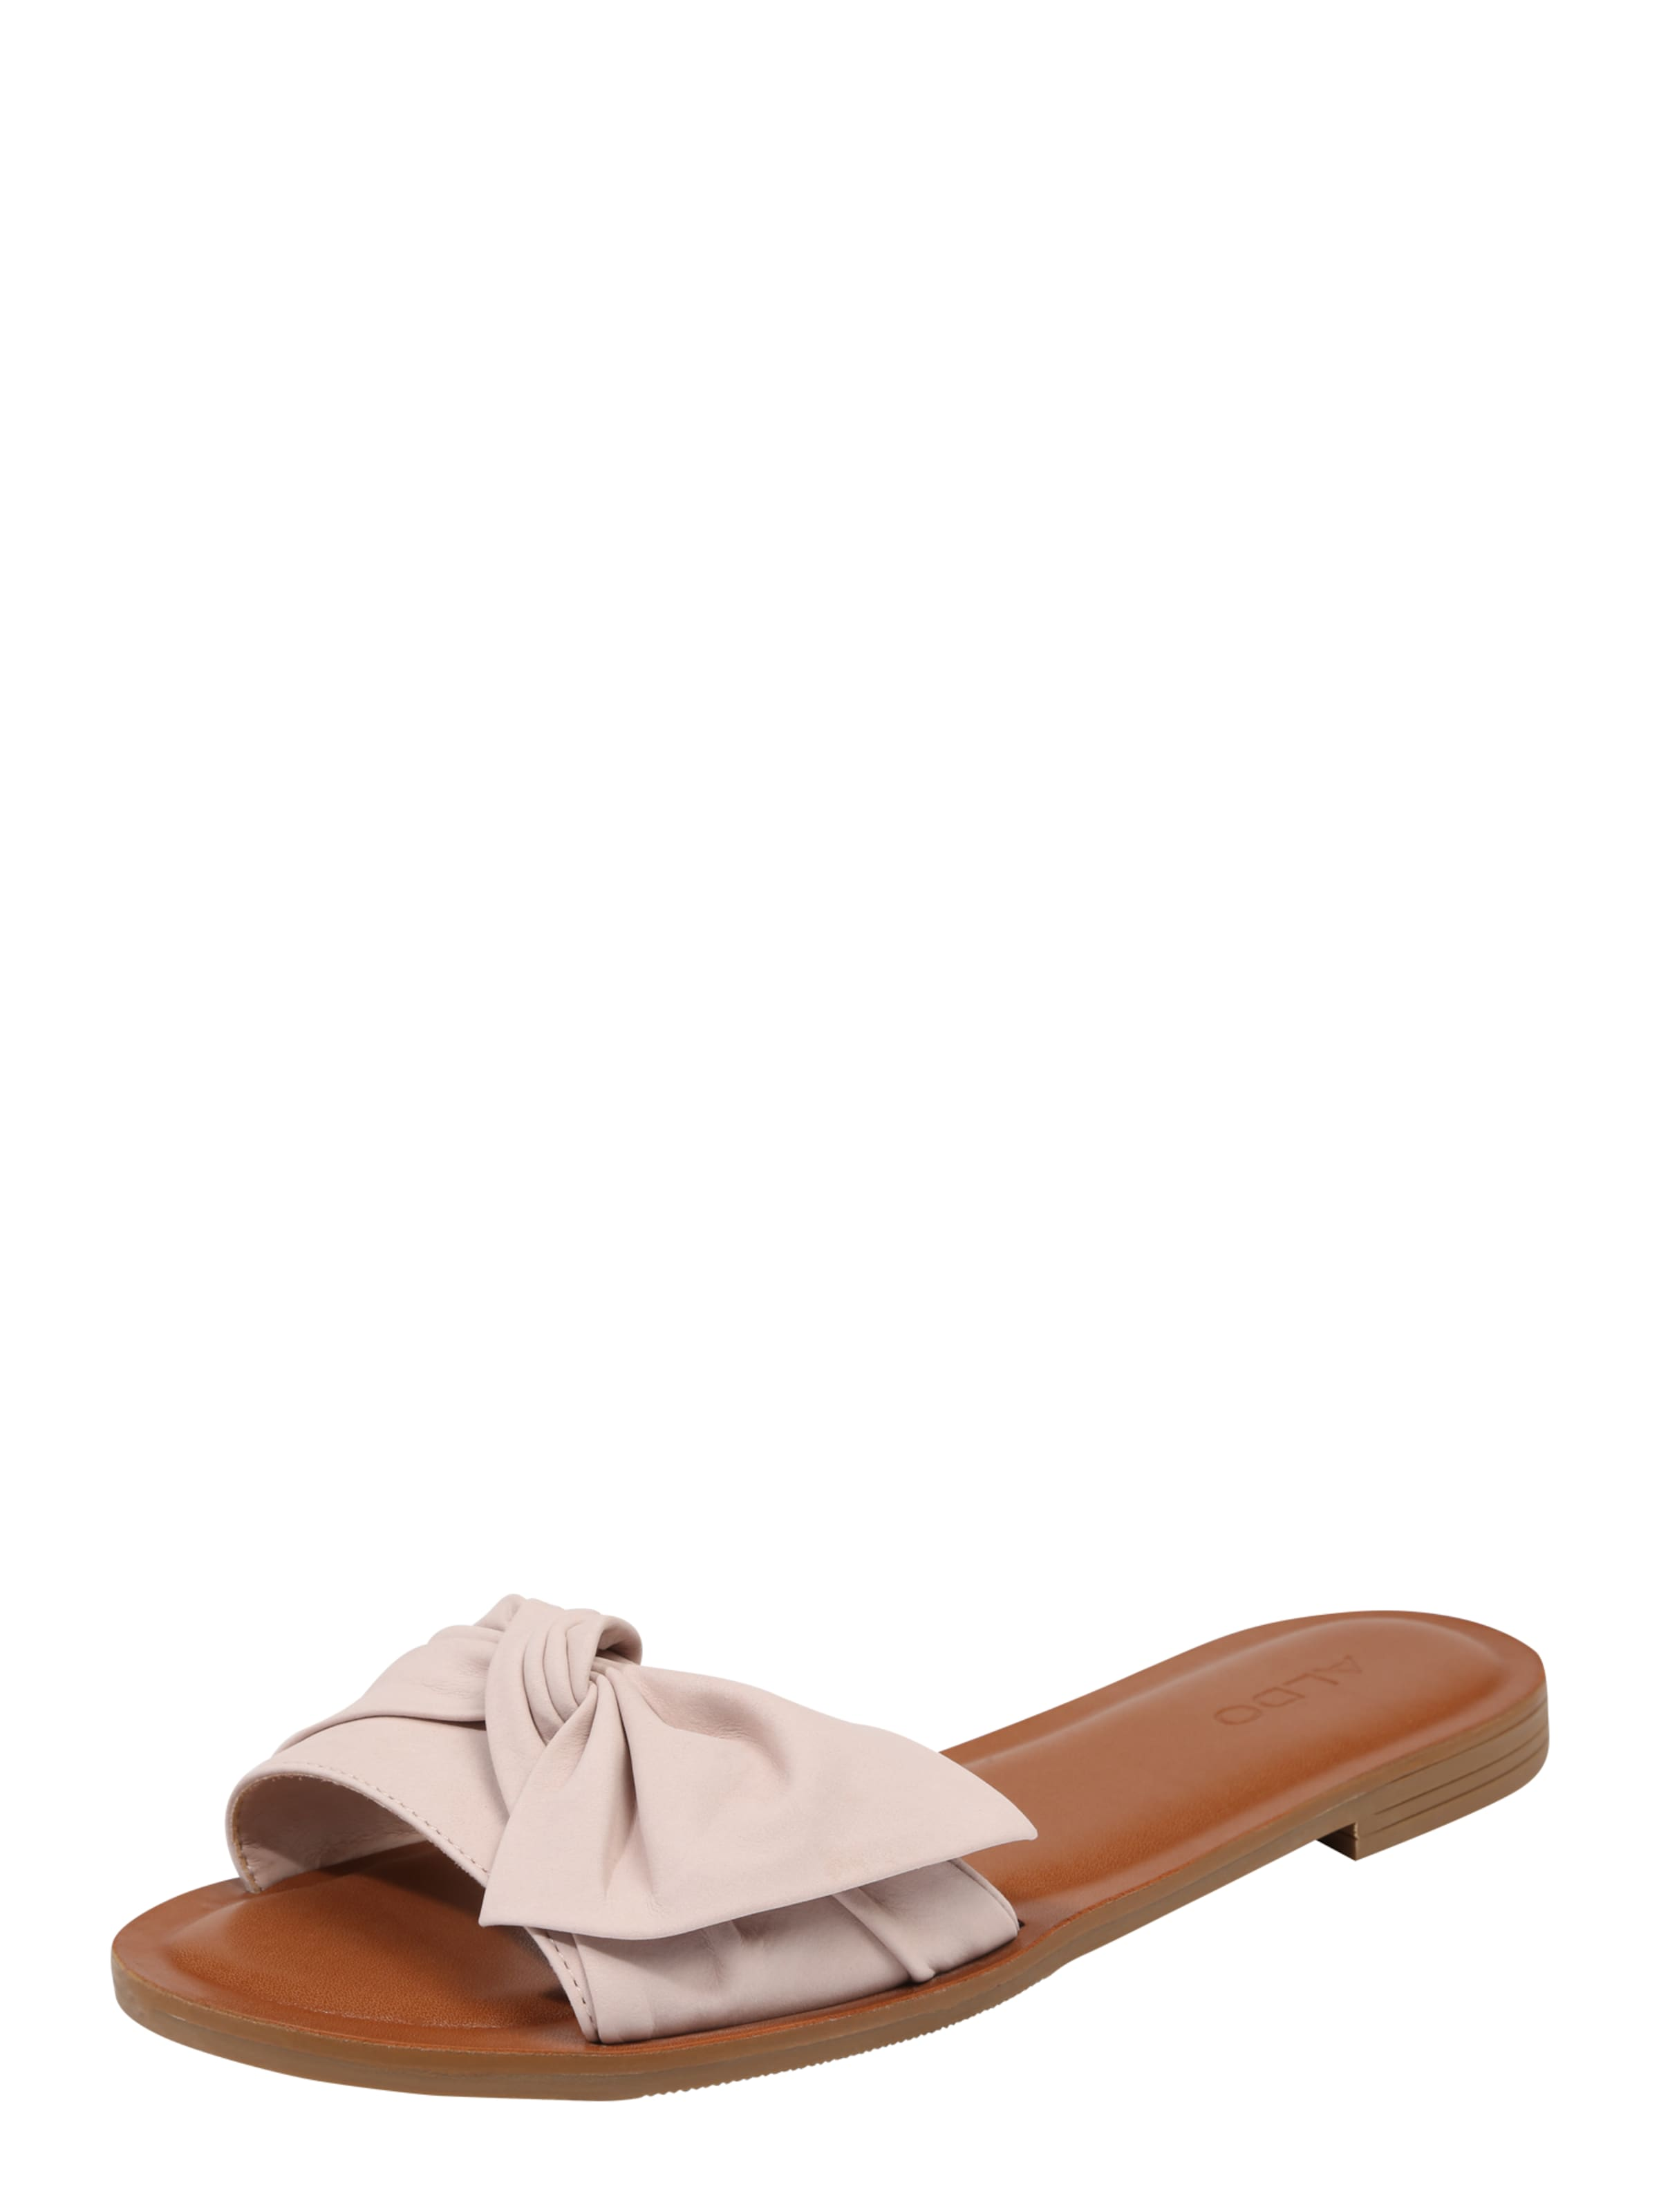 ALDO Sandalen ENROELIA Verschleißfeste Verschleißfeste ENROELIA billige Schuhe 53a2b0